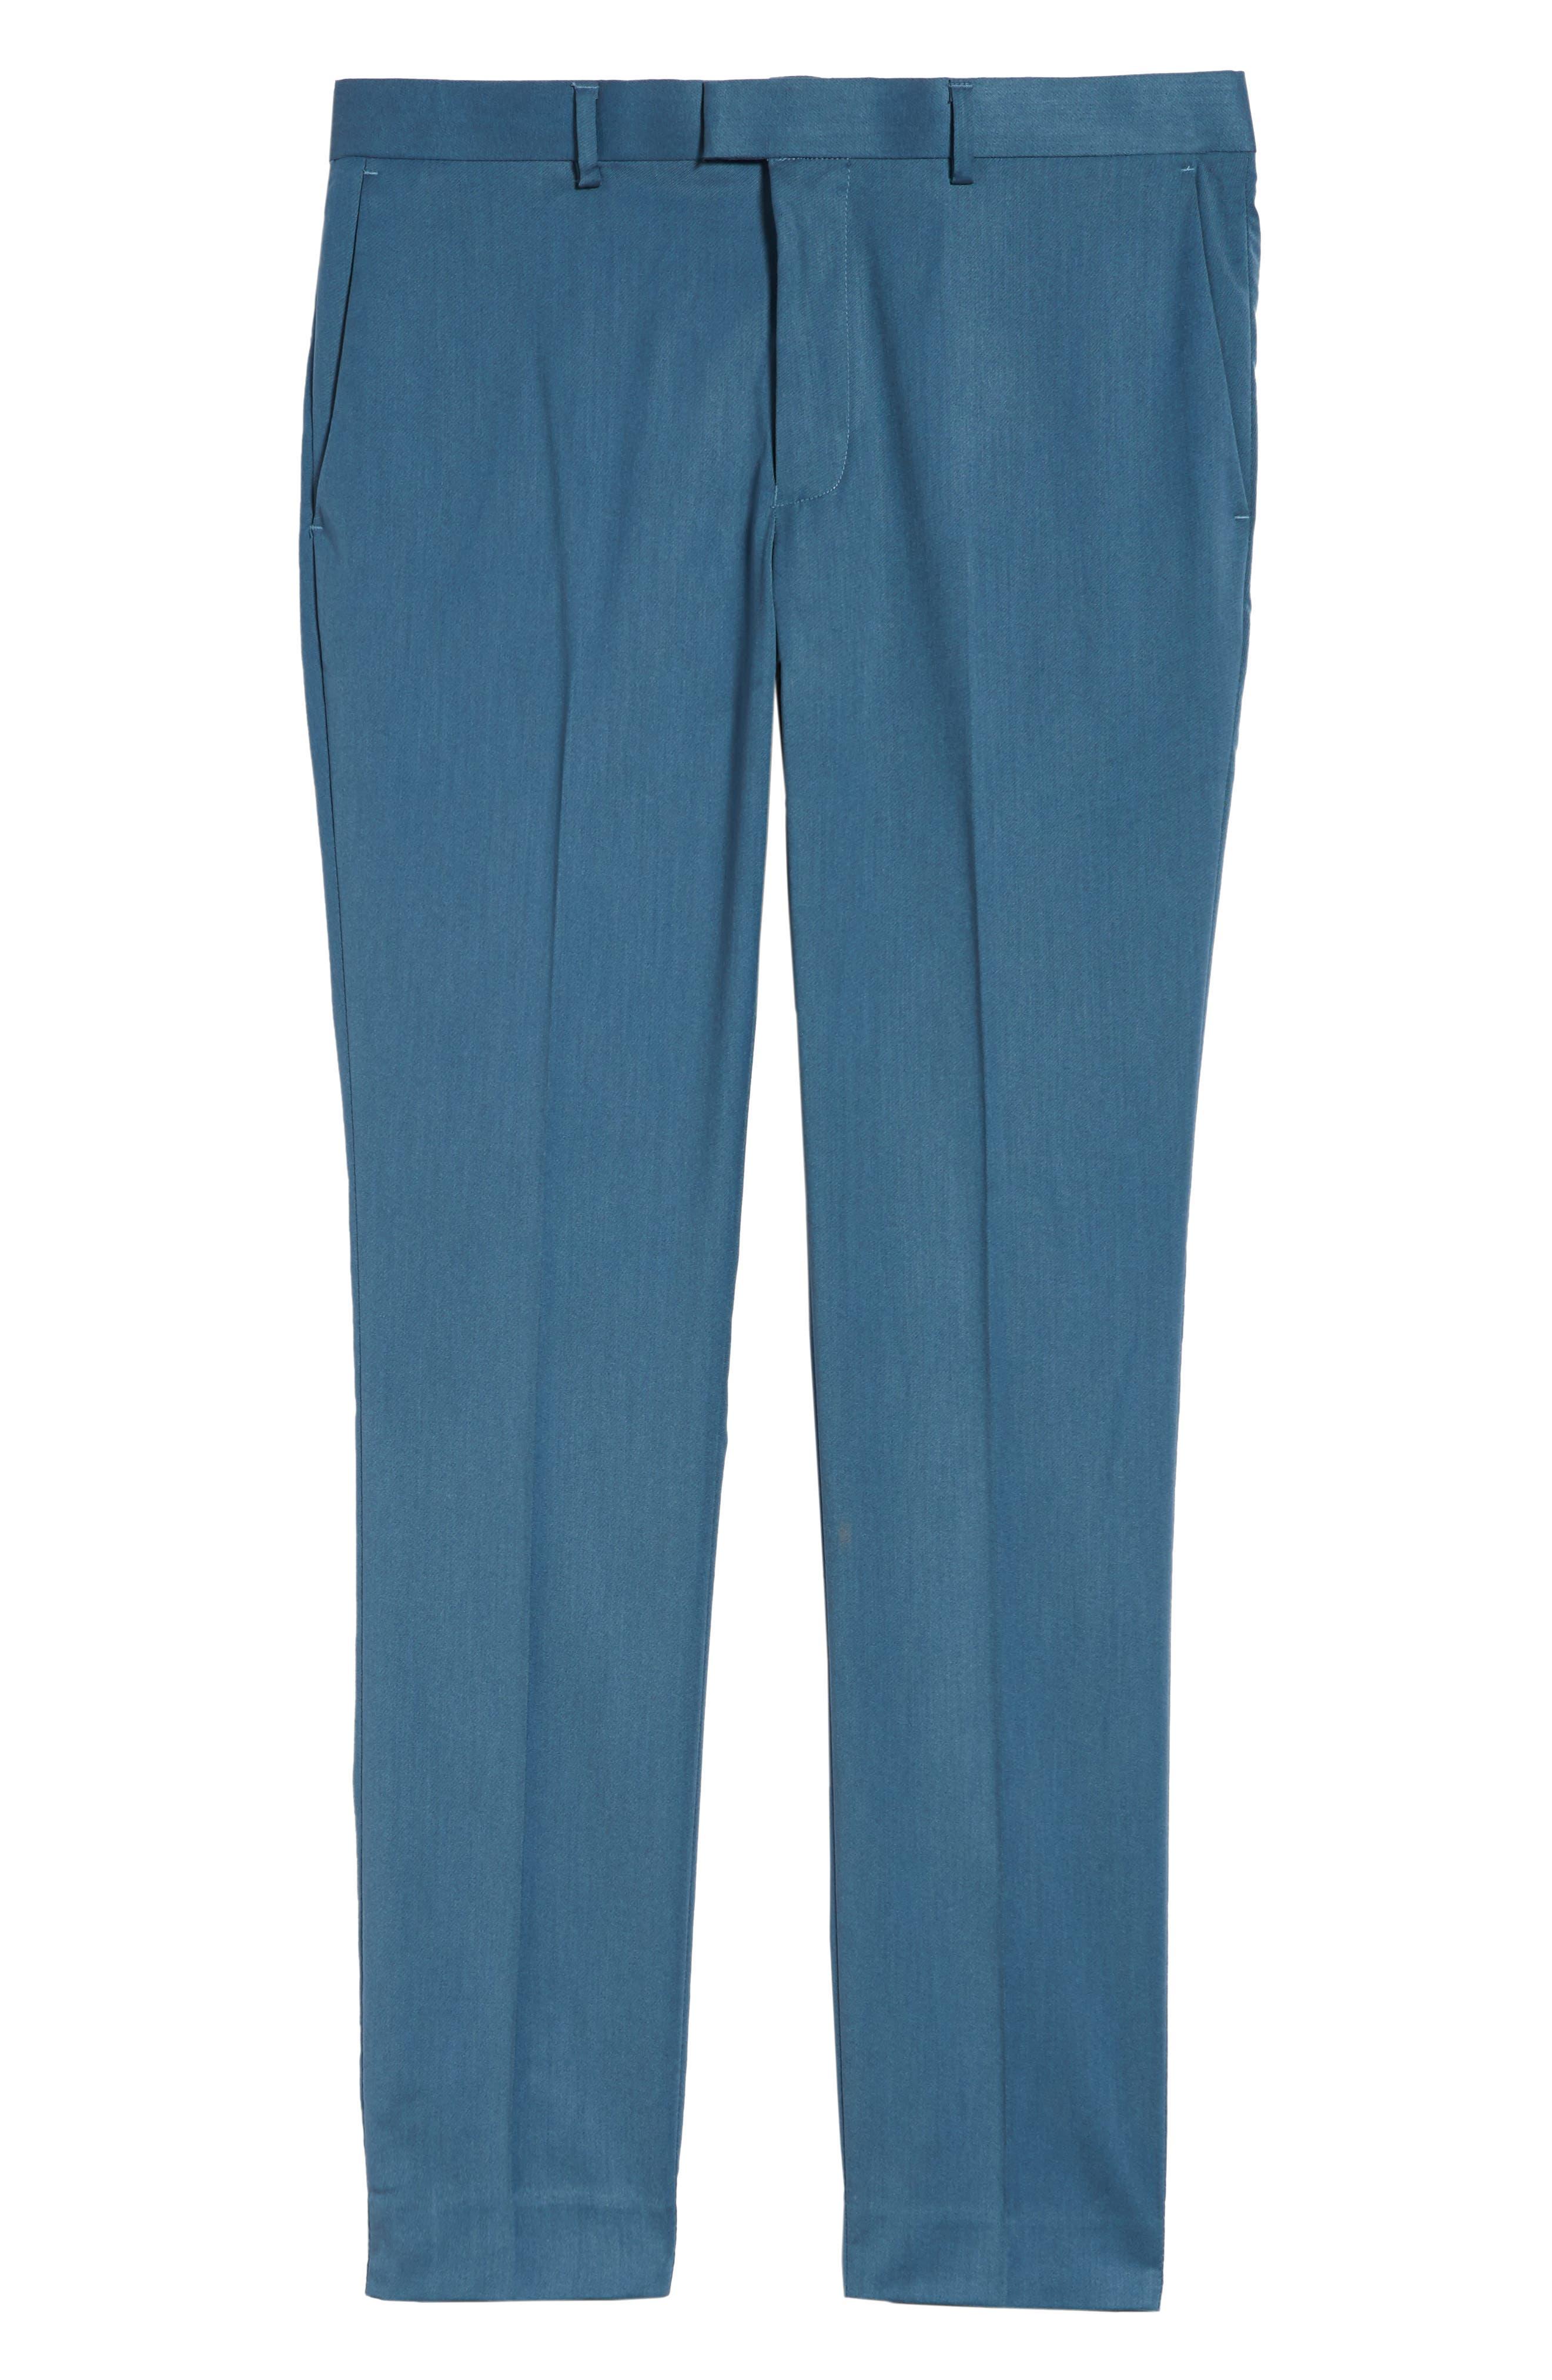 Skinny Fit Suit Trousers,                             Alternate thumbnail 6, color,                             Light Blue